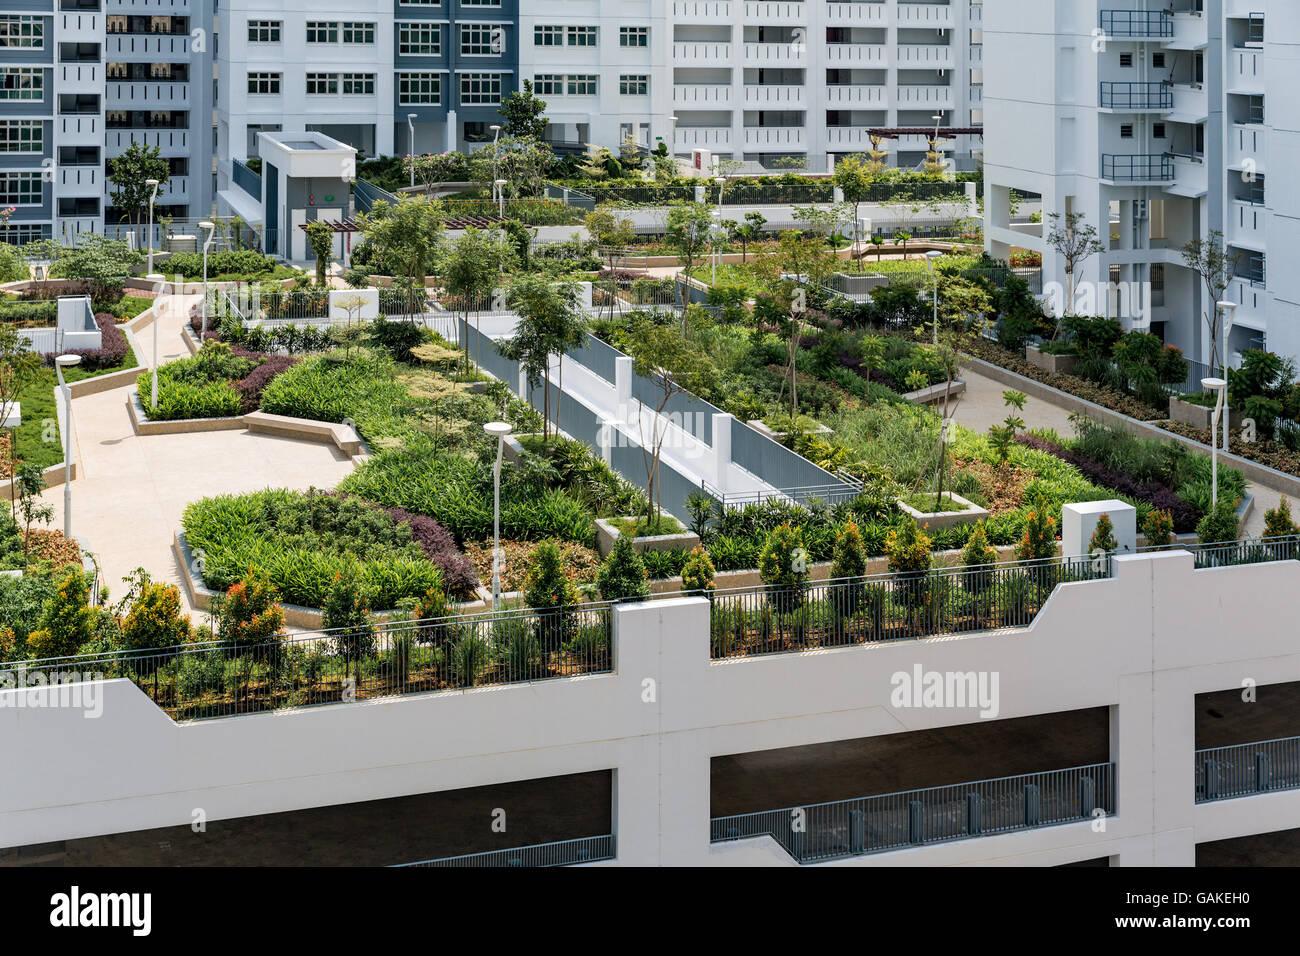 Roof top garden above car park in new singapore public for Home garden design singapore